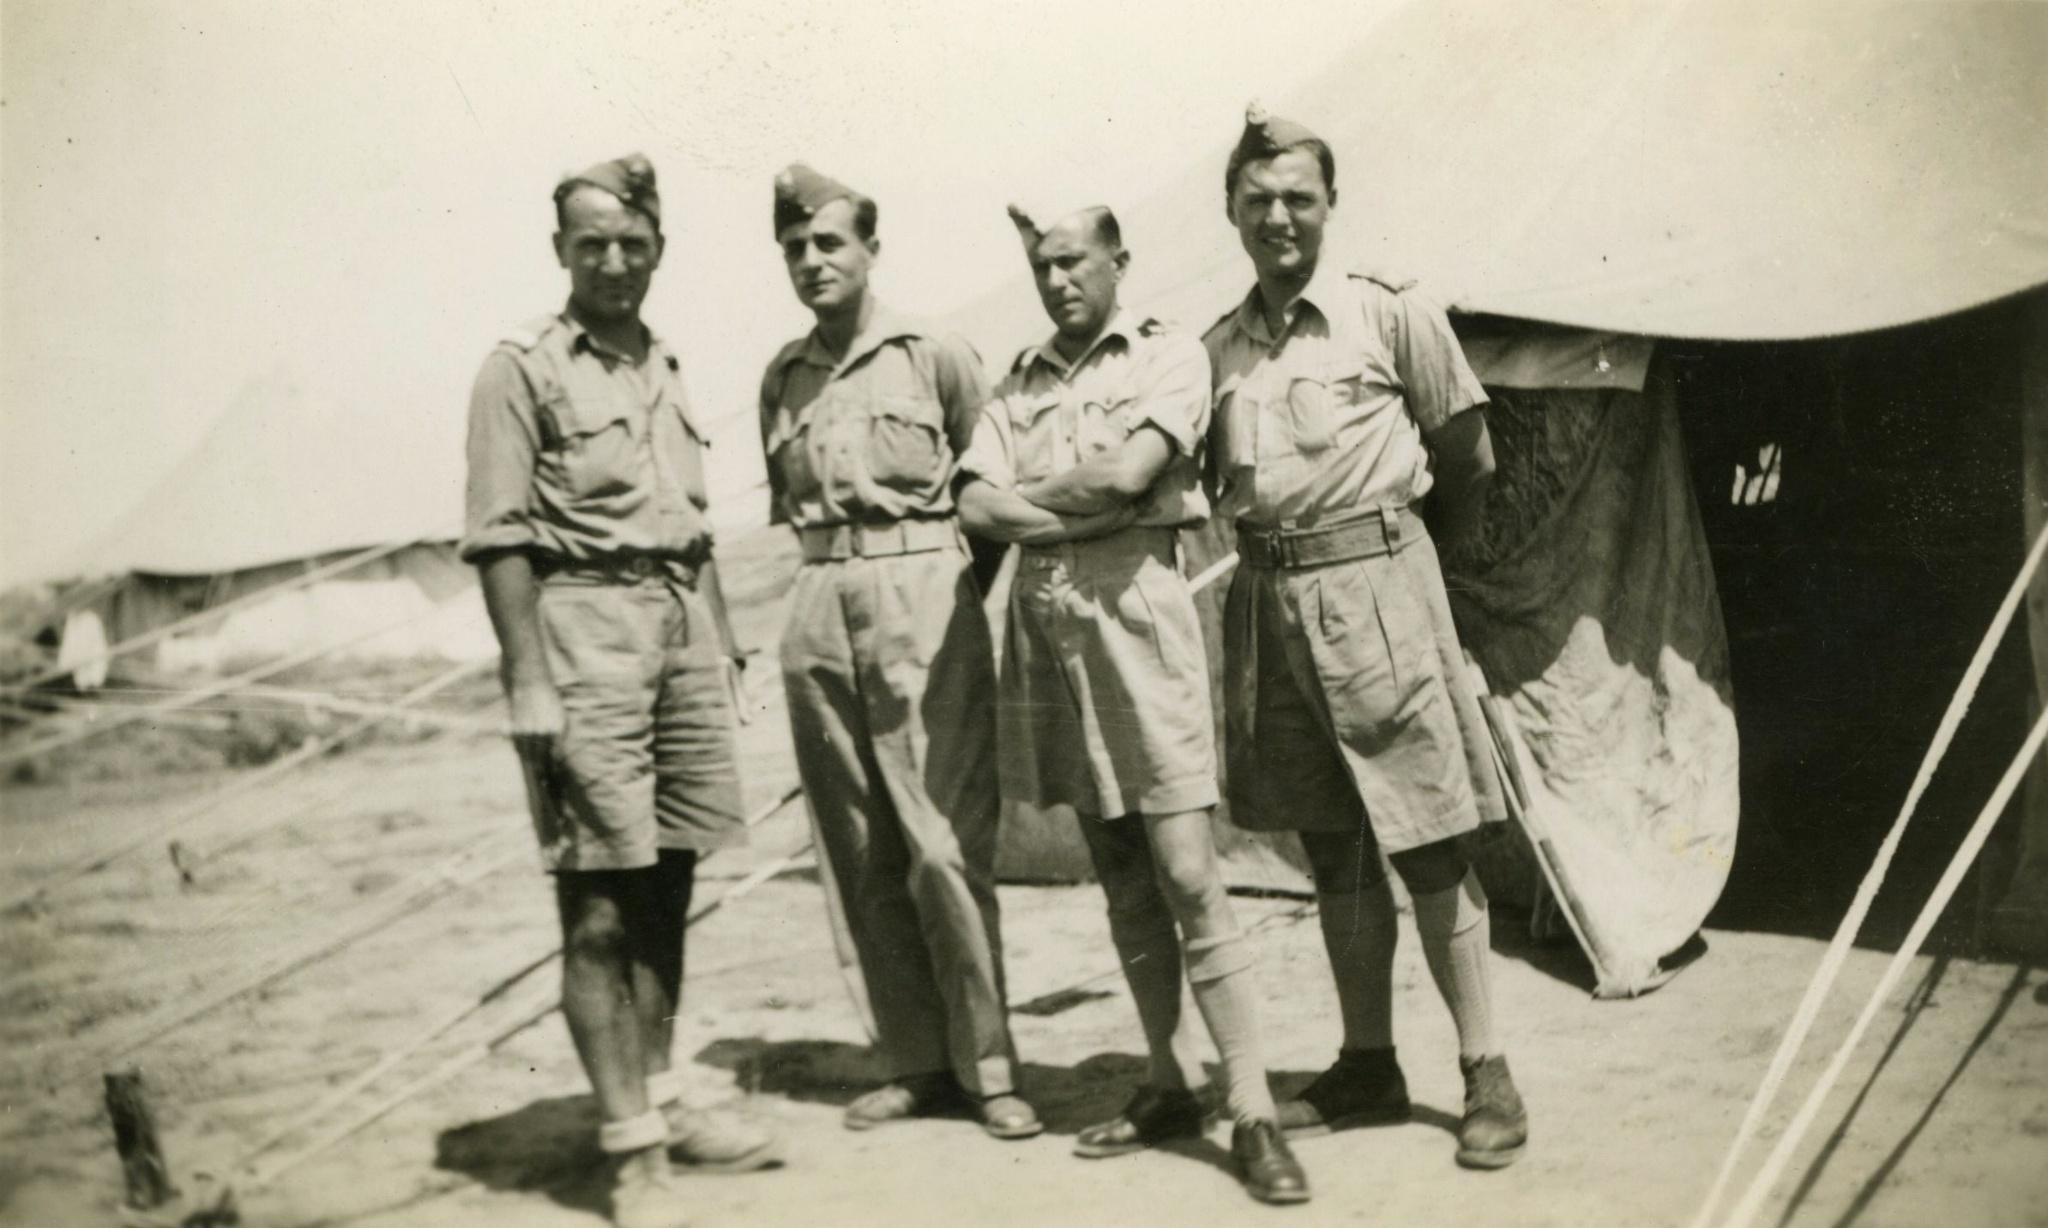 <div class='inner-box'><div class='close-desc'></div><span class='opis'>Jerzy Giedroyc (drugi od lewej) wśród żołnierzy Brygady Karpackiej, Libia, 1941-1942.</span><div class='clearfix'></div><span>Archive ref. FIL00075</span><div class='clearfix'></div><span>© Instytut Literacki</span></div>